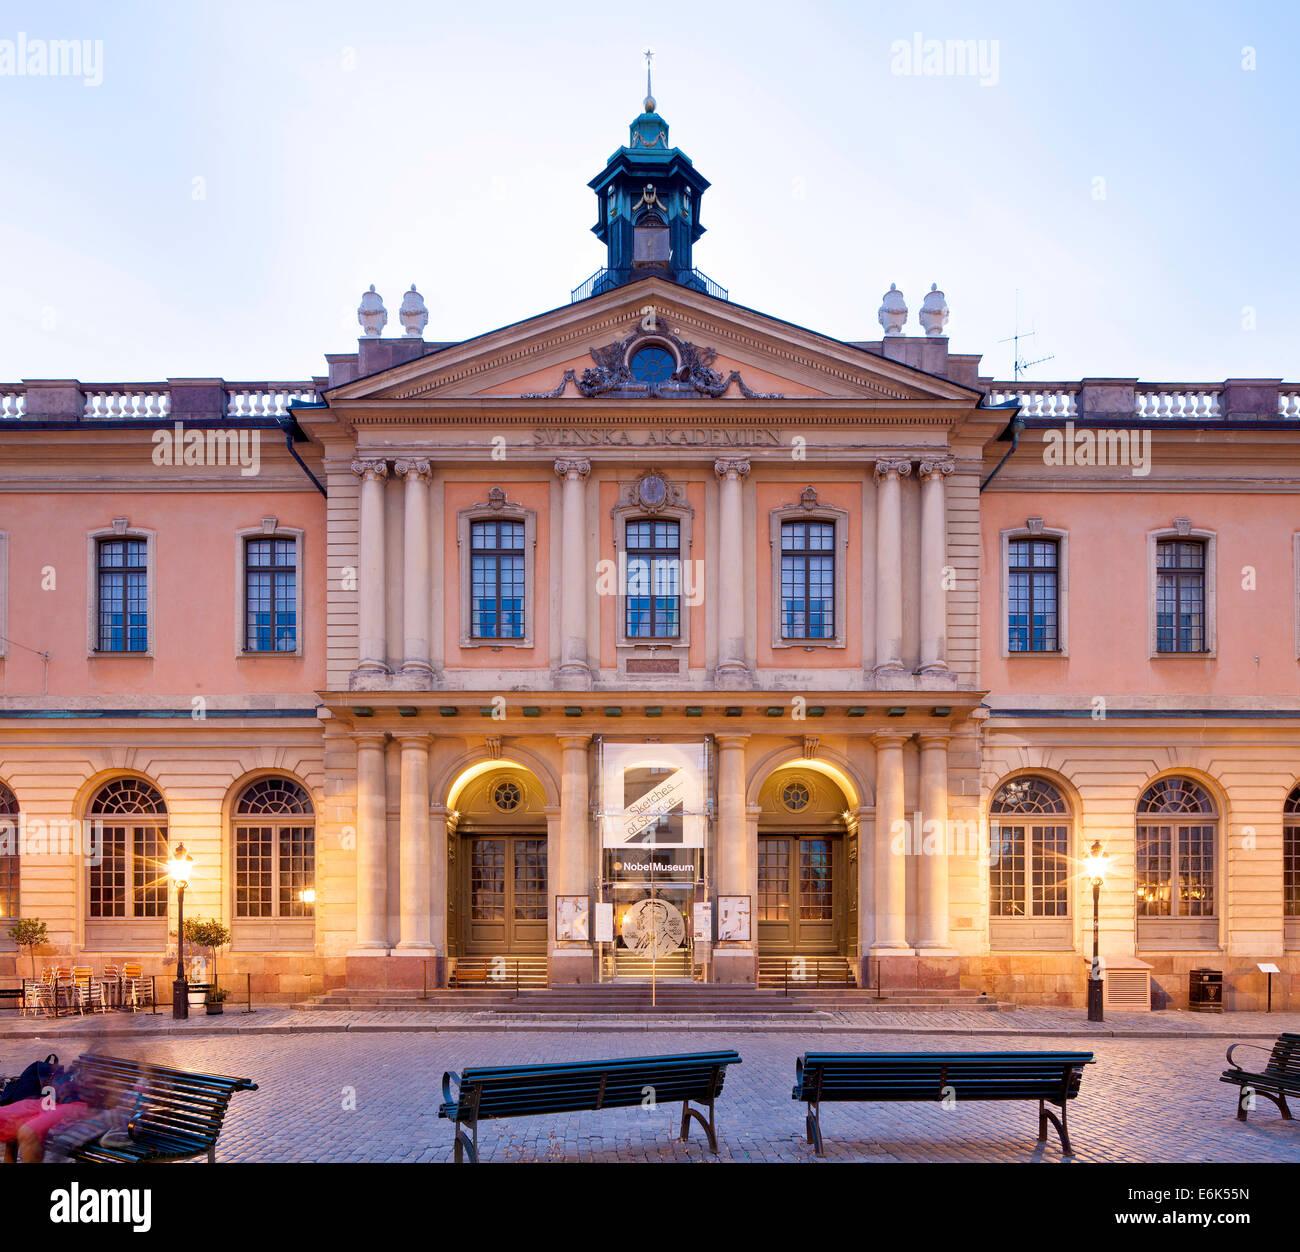 Swedish Academy of Sciences, Svenska Akademien, former stock exchange building, Börshuset, Stortorget square, - Stock Image